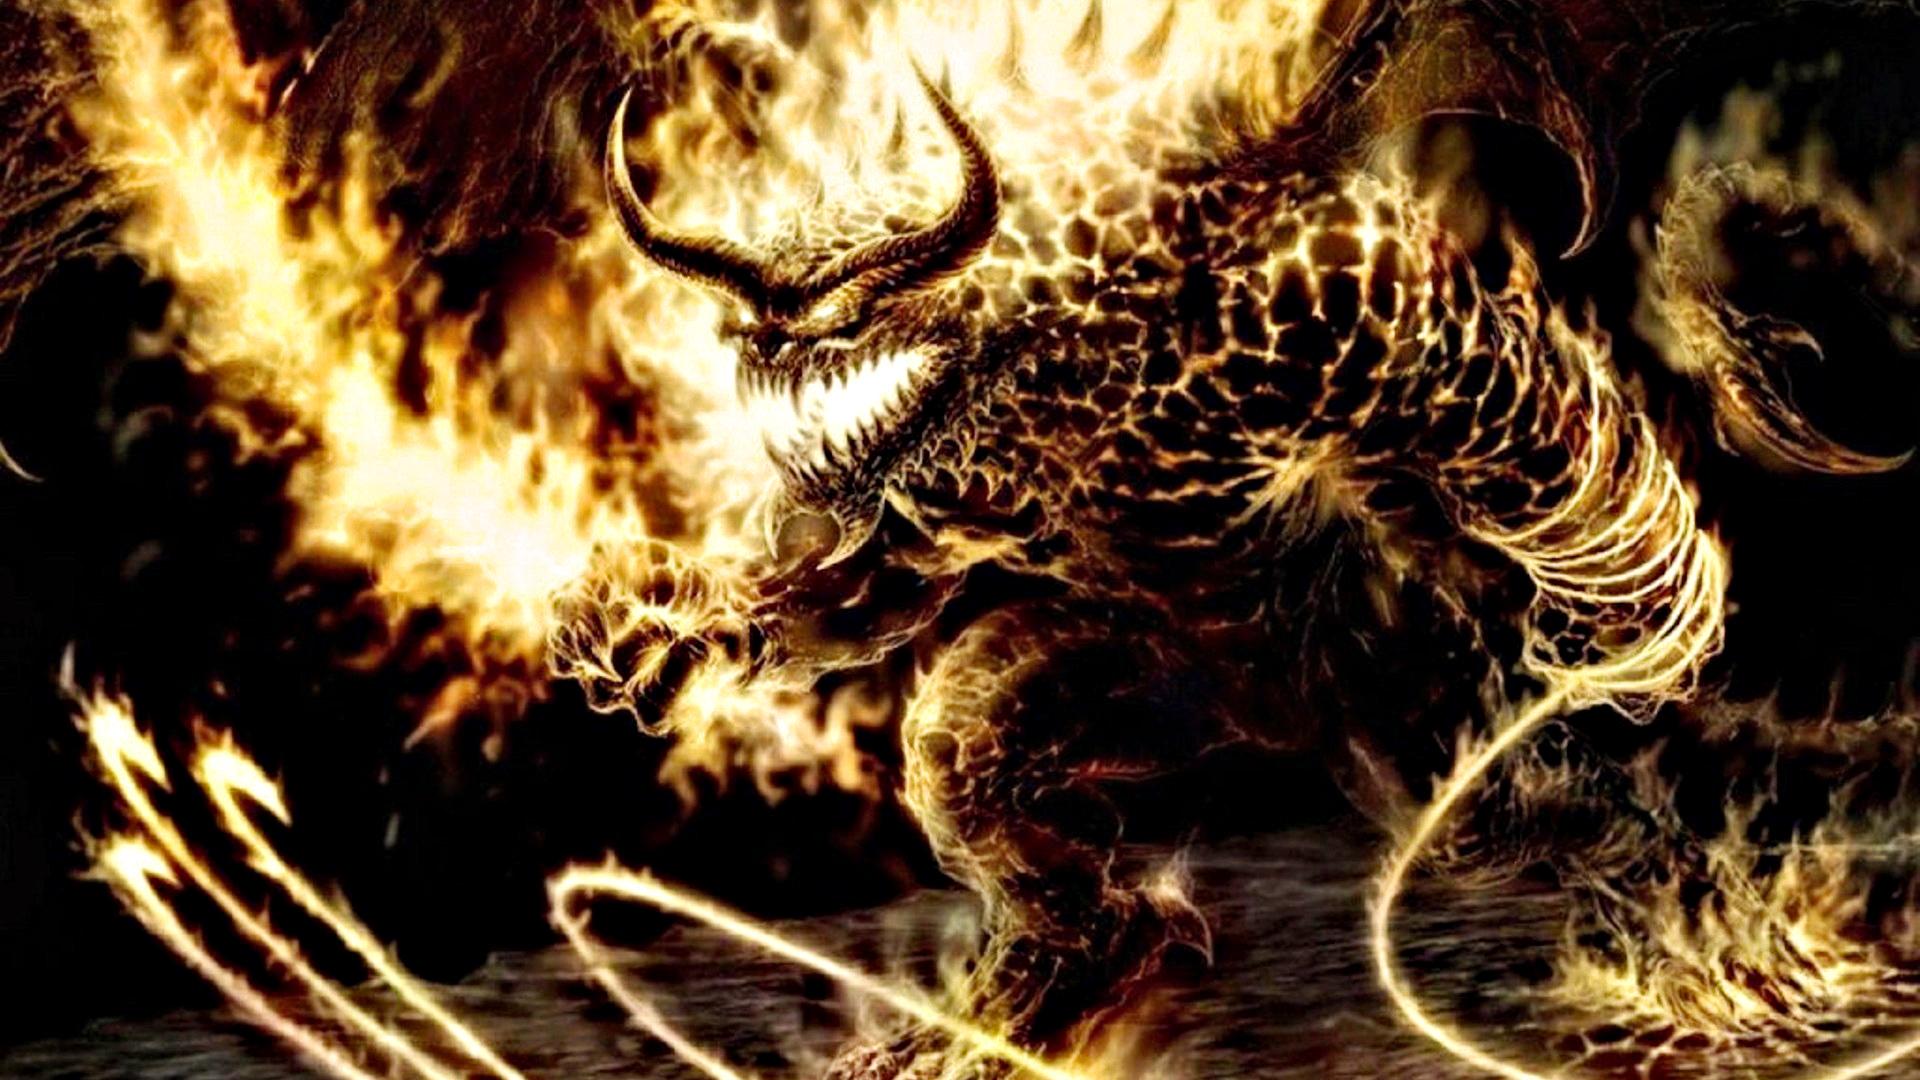 Bull Devil Demon of Hell Wallpaper HD 3219 Wallpaper with 1920x1080 1920x1080